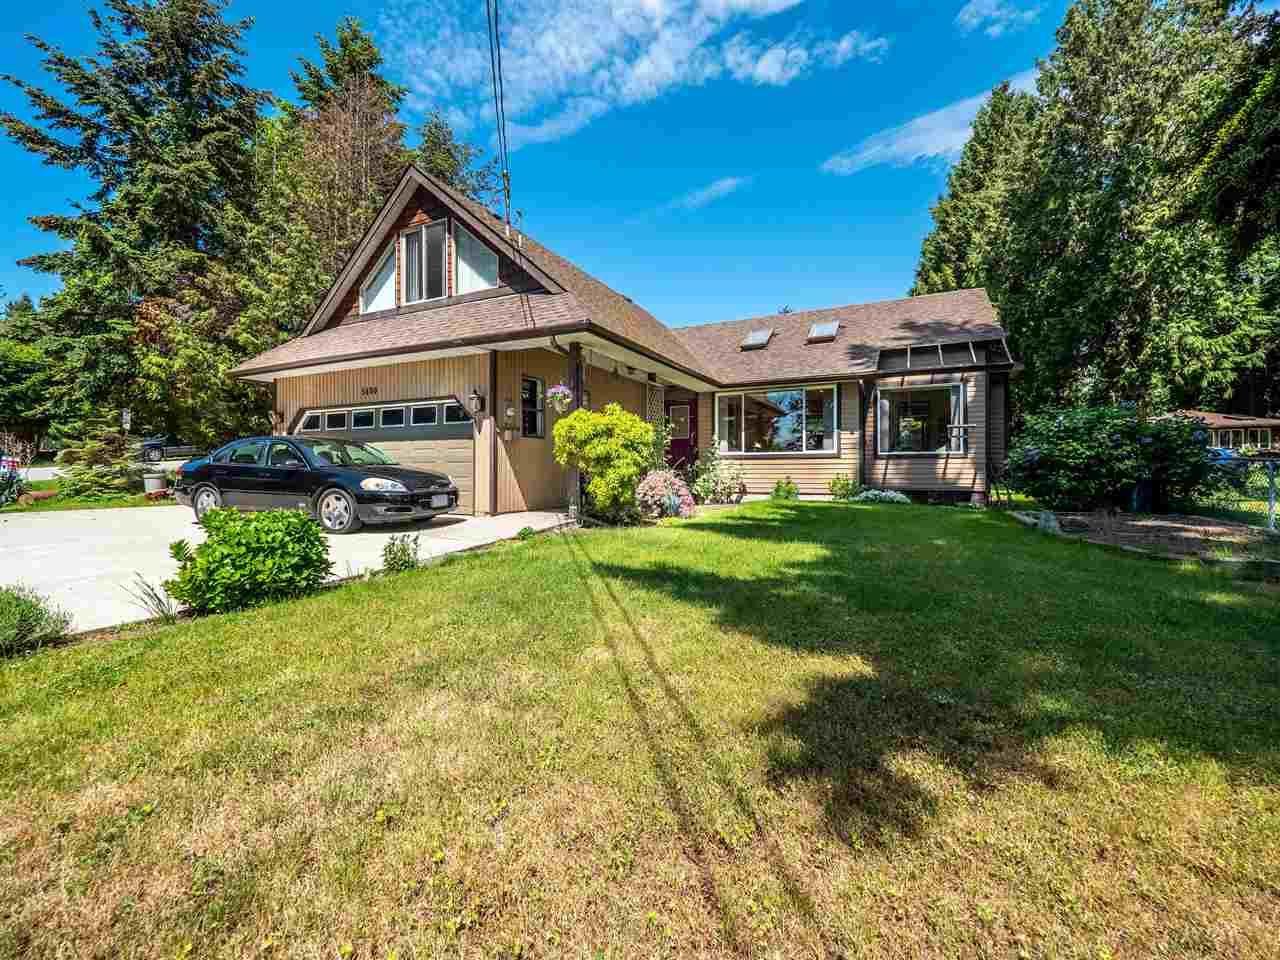 Main Photo: 5400 DERBY Road in Sechelt: Sechelt District House for sale (Sunshine Coast)  : MLS®# R2454409